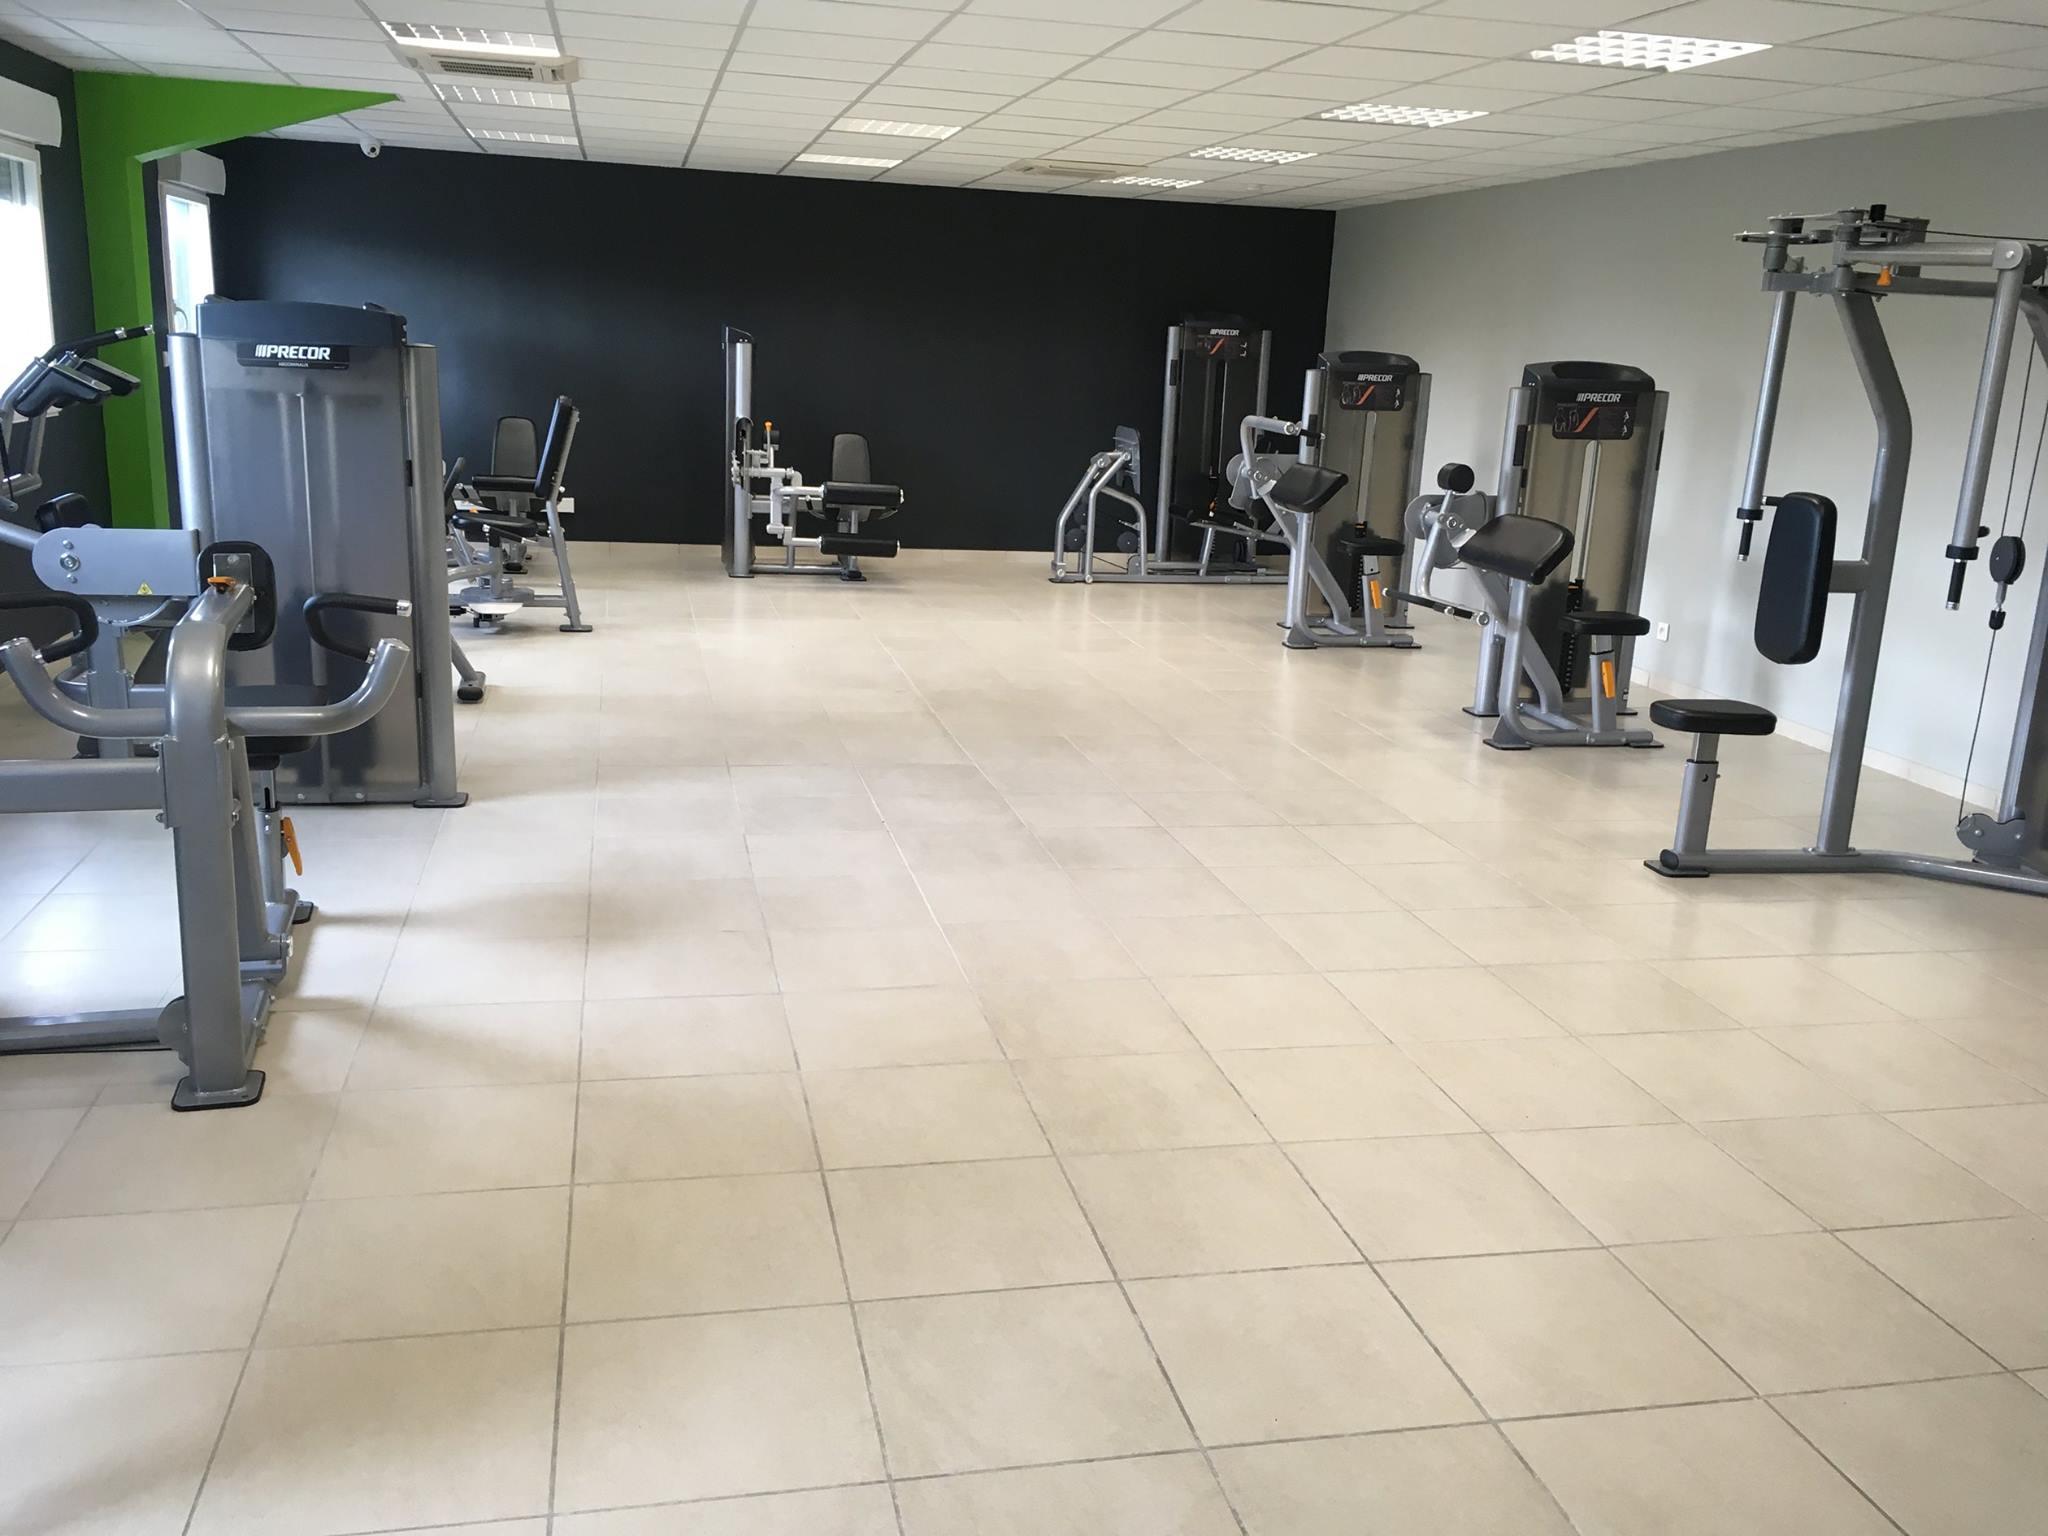 liberty gym saint marcel l s valence salles de. Black Bedroom Furniture Sets. Home Design Ideas